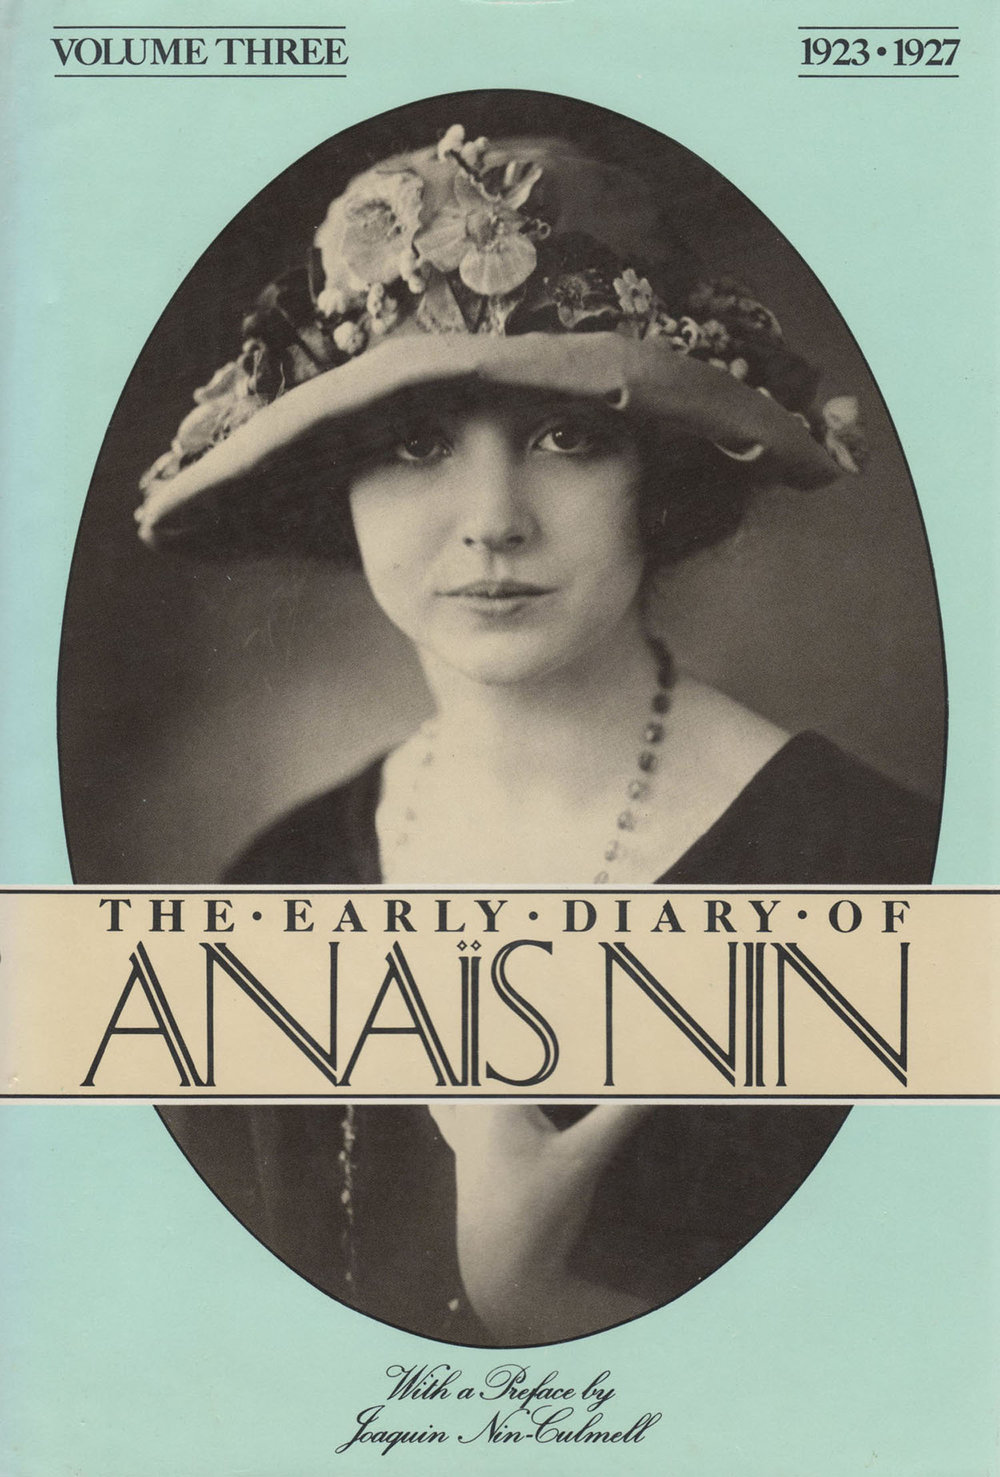 The Early Diary of Anais Nin Volume Three